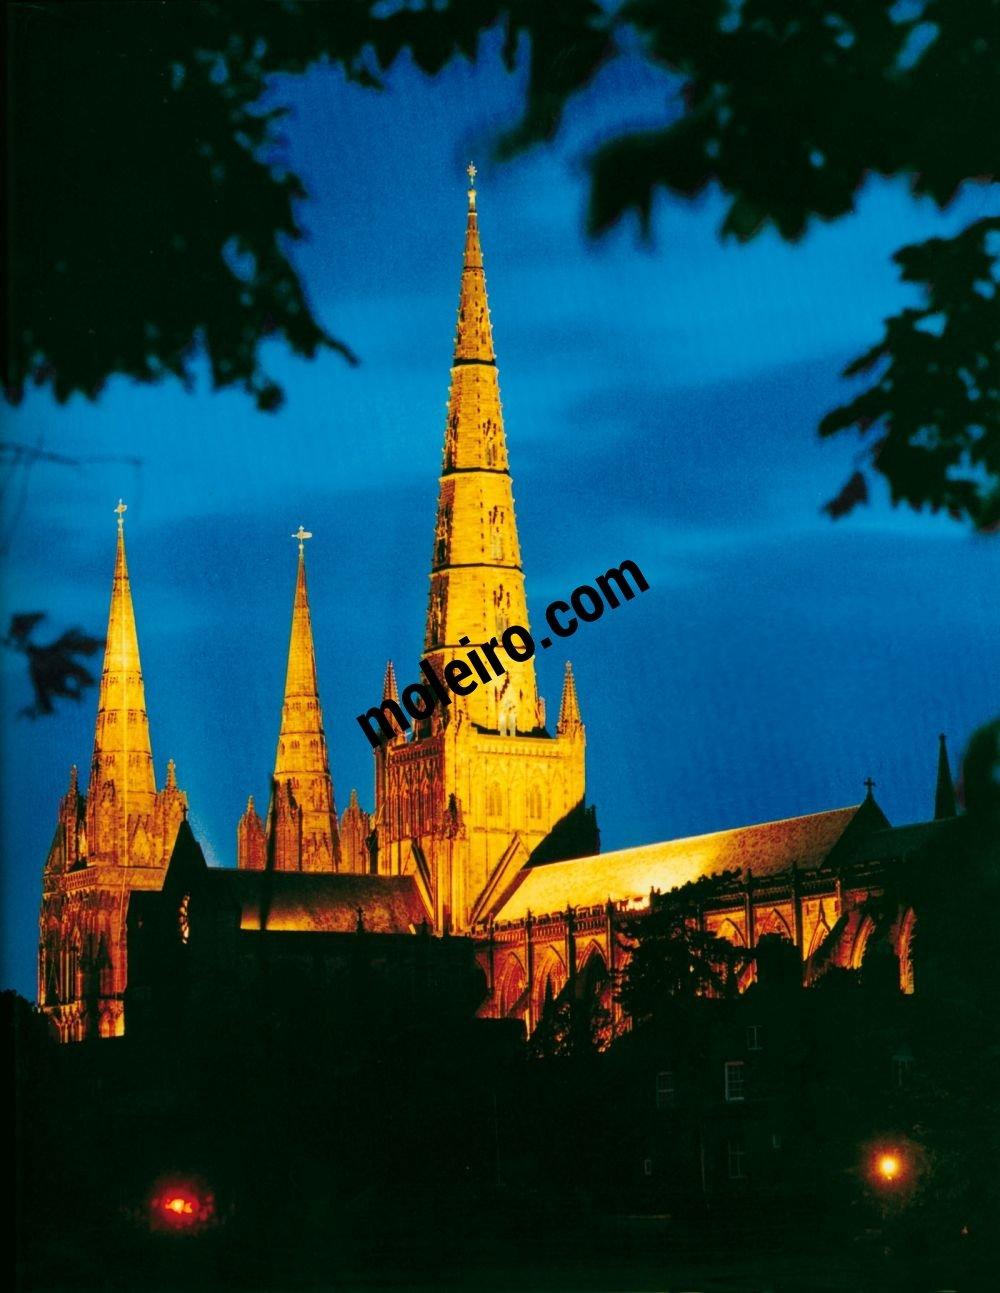 Talleres de Arquitectura en la Edad Media Lichfield, Birmingham, Inglaterra, torre, siglo XII o XIII